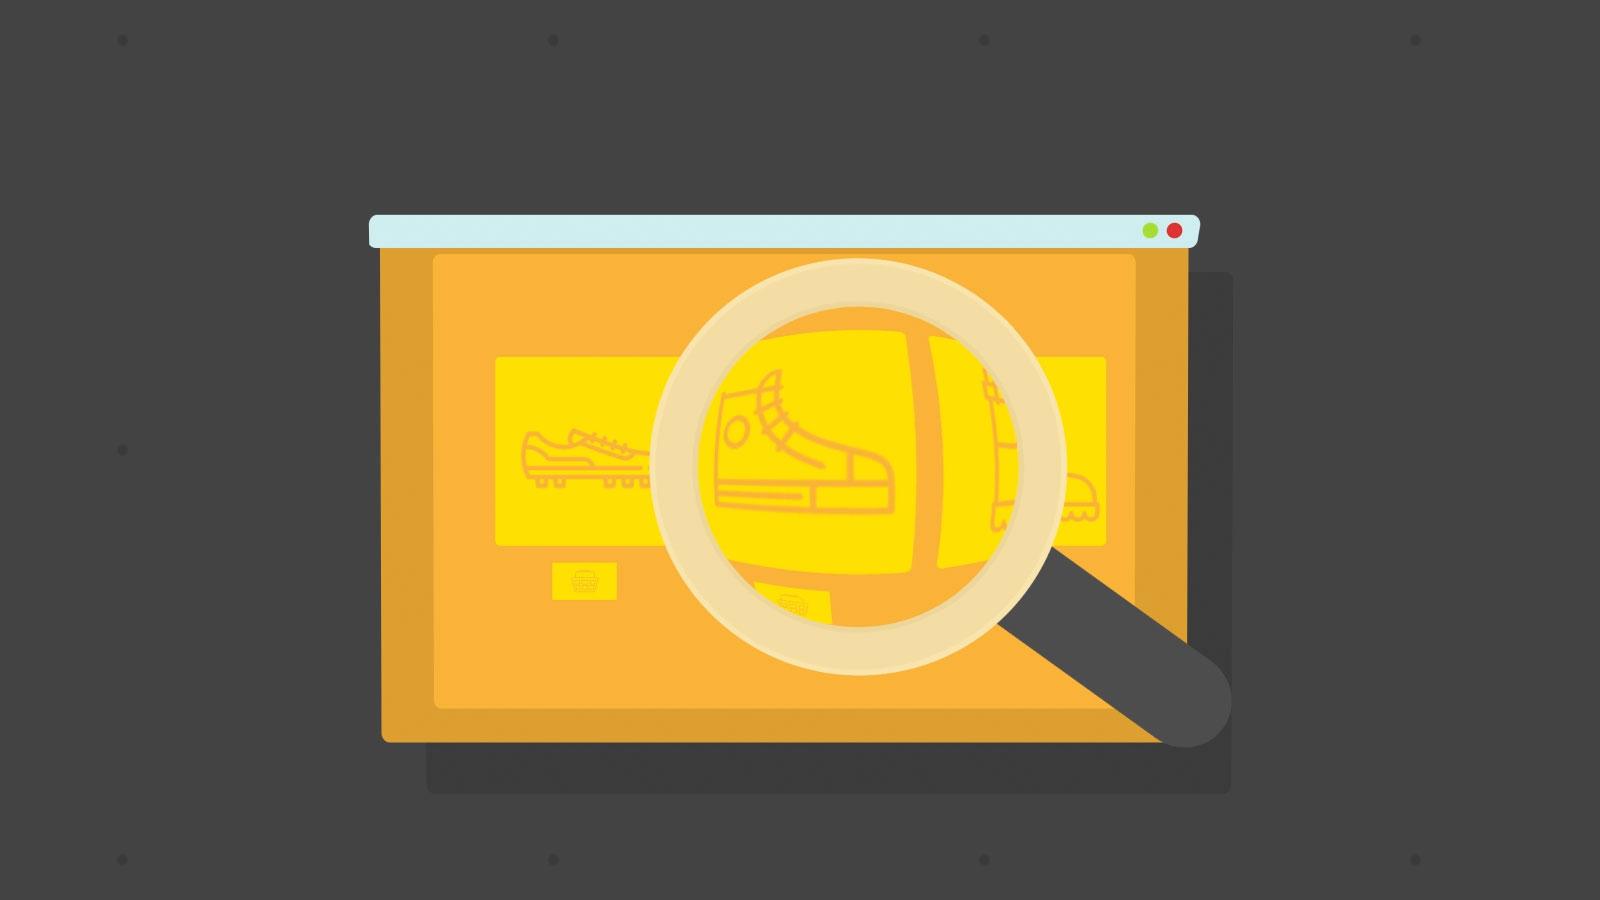 5 razoes para investir videos de animacao 2 - 5 razões para você investir em vídeos de animação para a sua empresa